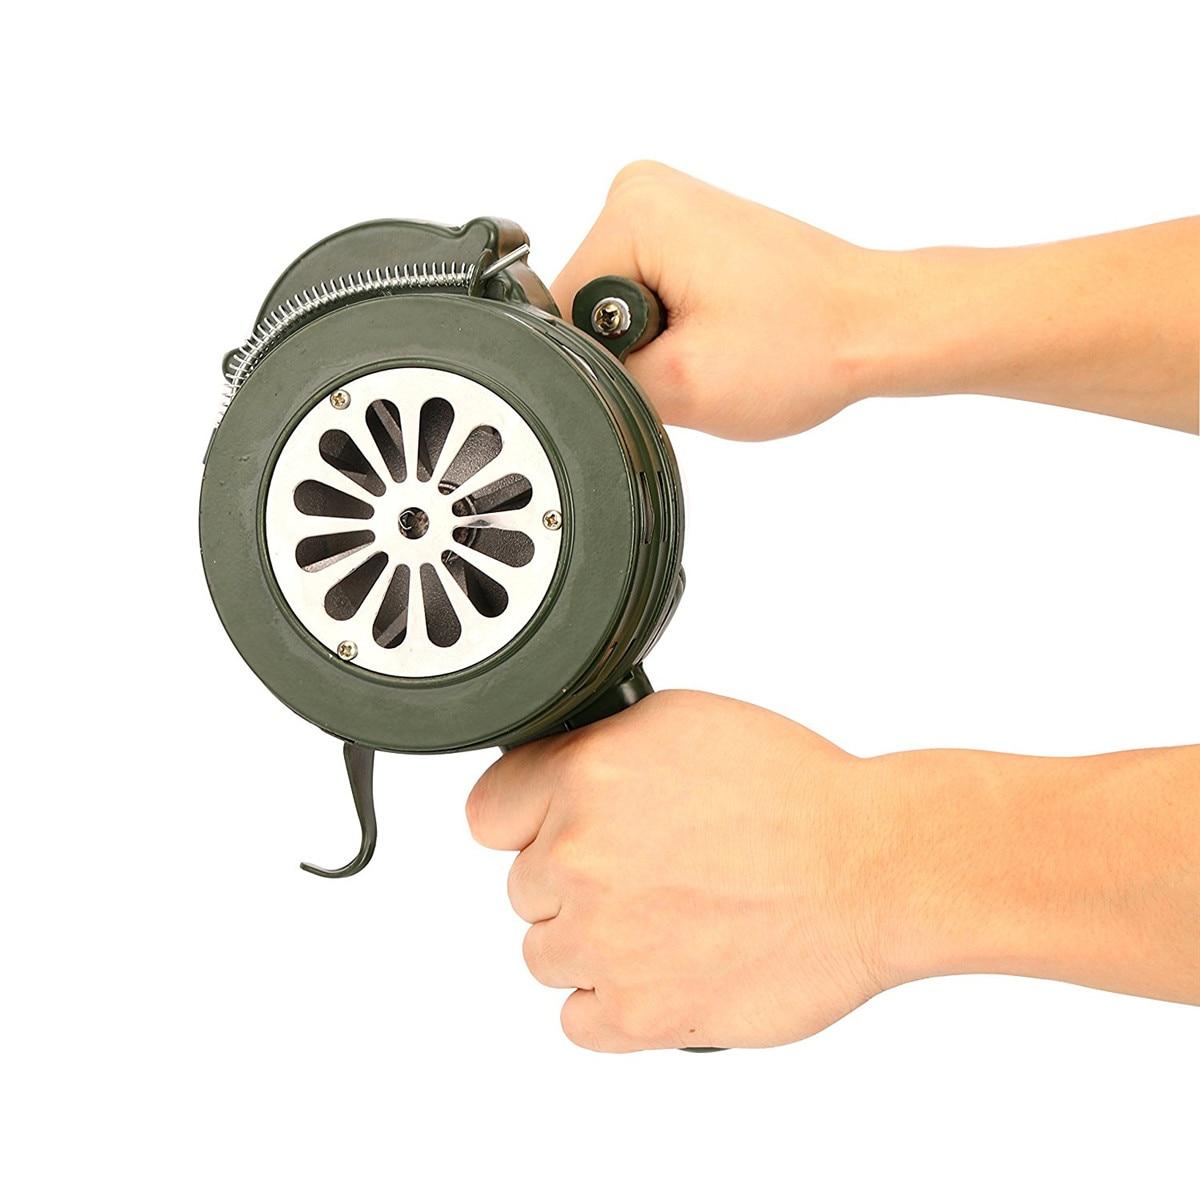 Safurance Green Aluminium alloy Crank Hand Operated Air Raid Emergency Safety Alarm Siren Home Self Protection Security